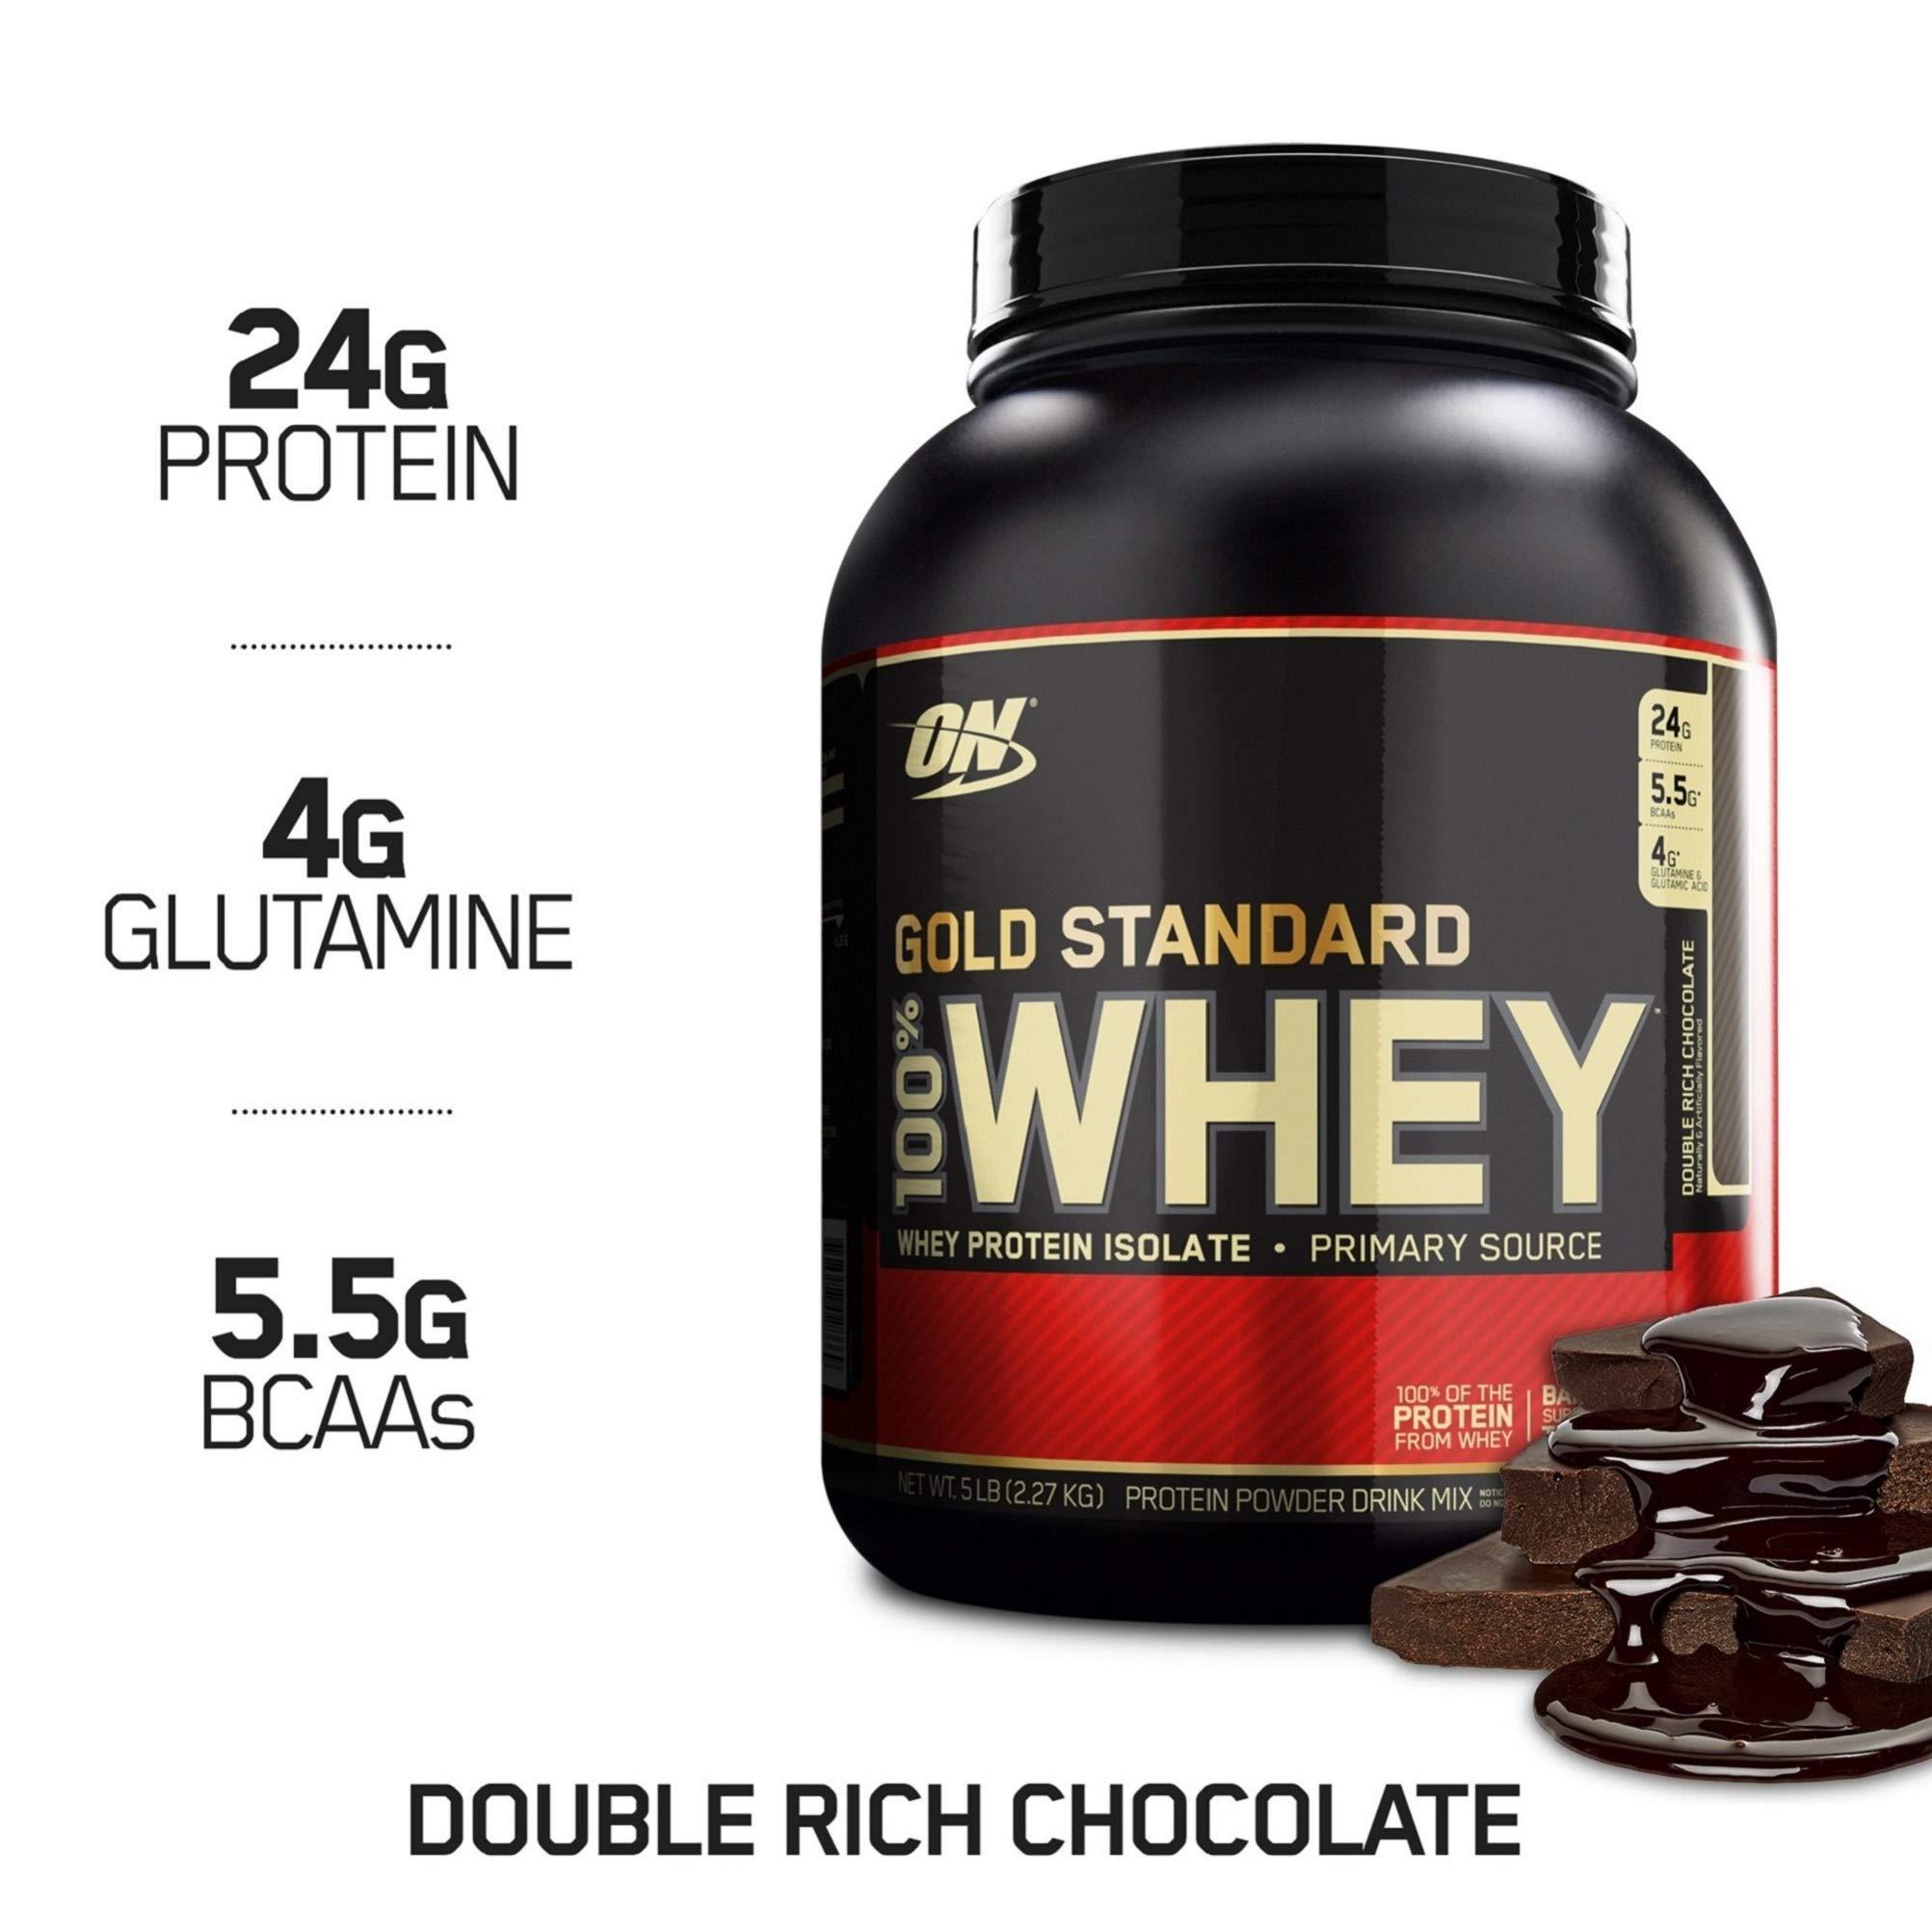 OPTIMUM NUTRITION GOLD STANDARD 100% Whey Protein Powder, Double Rich Chocolate, 5 Pound